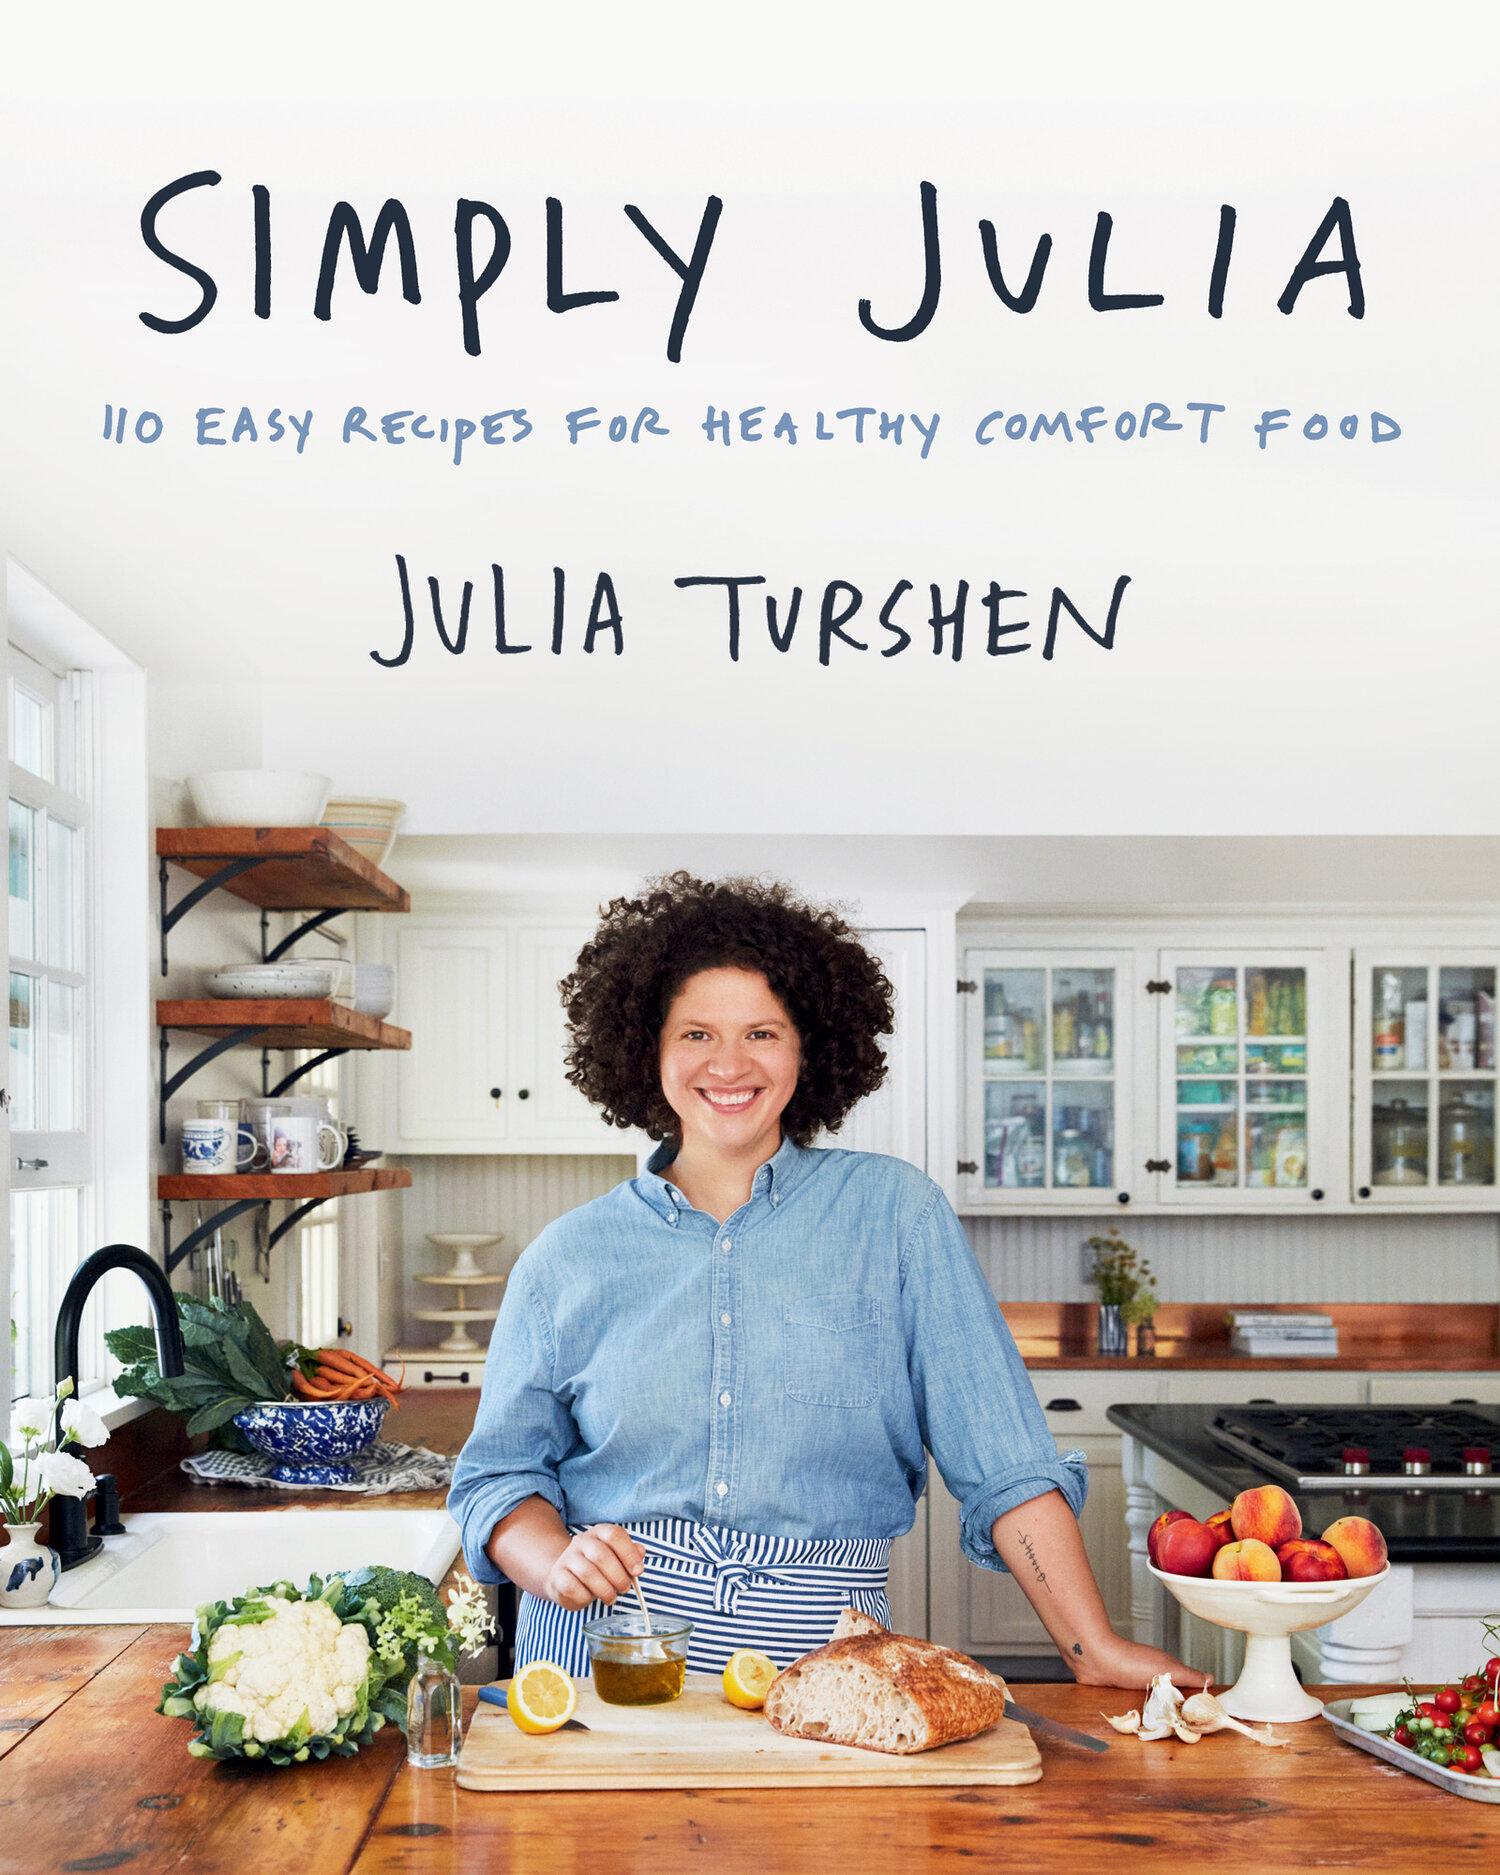 SimplyJulia_JuliaTurshen_Cover